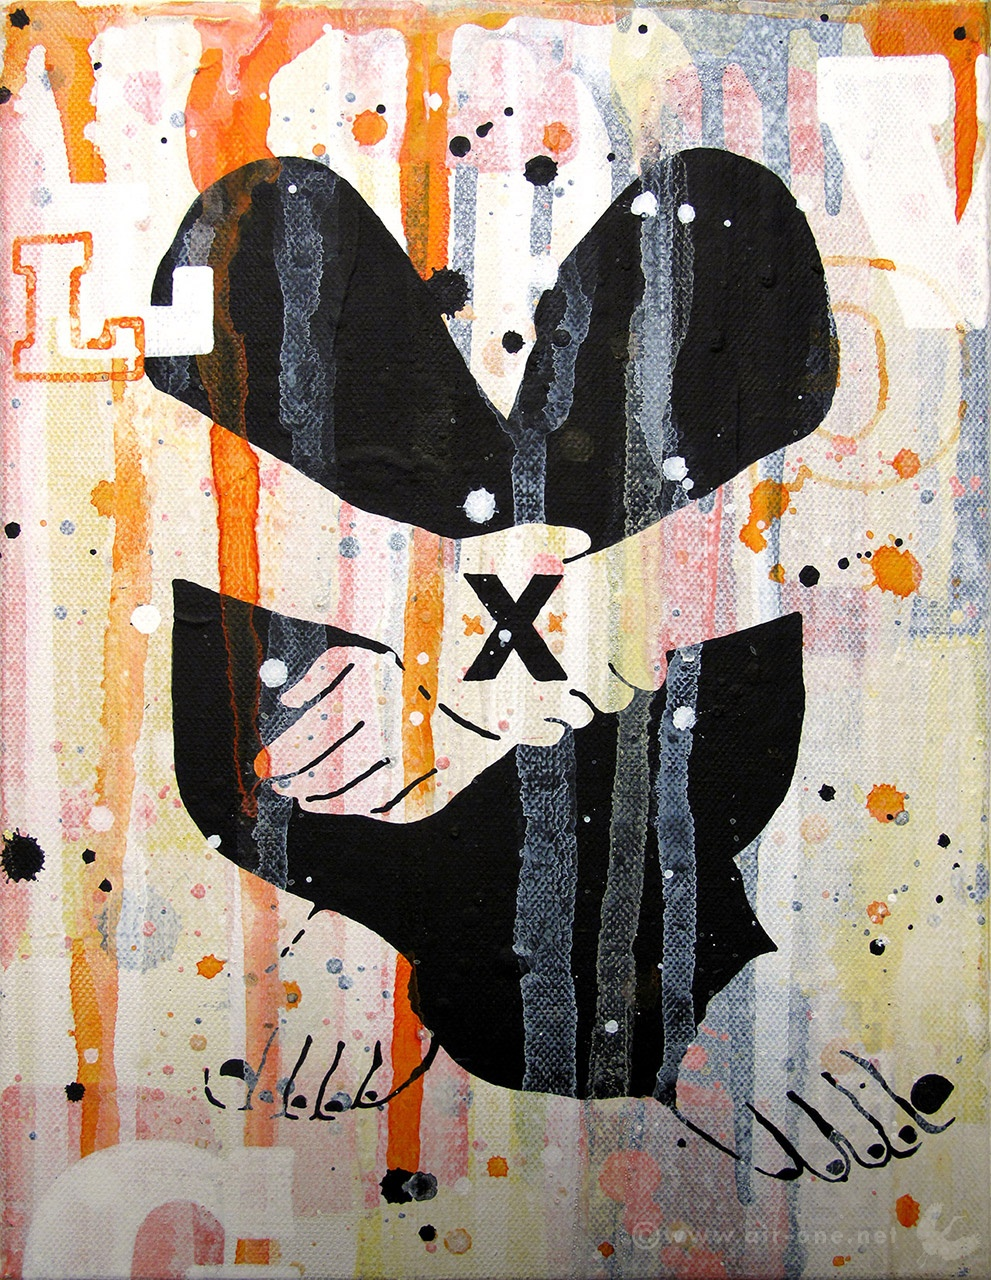 Airone - XXX - Mixed media on canvas 30x24 - 2011